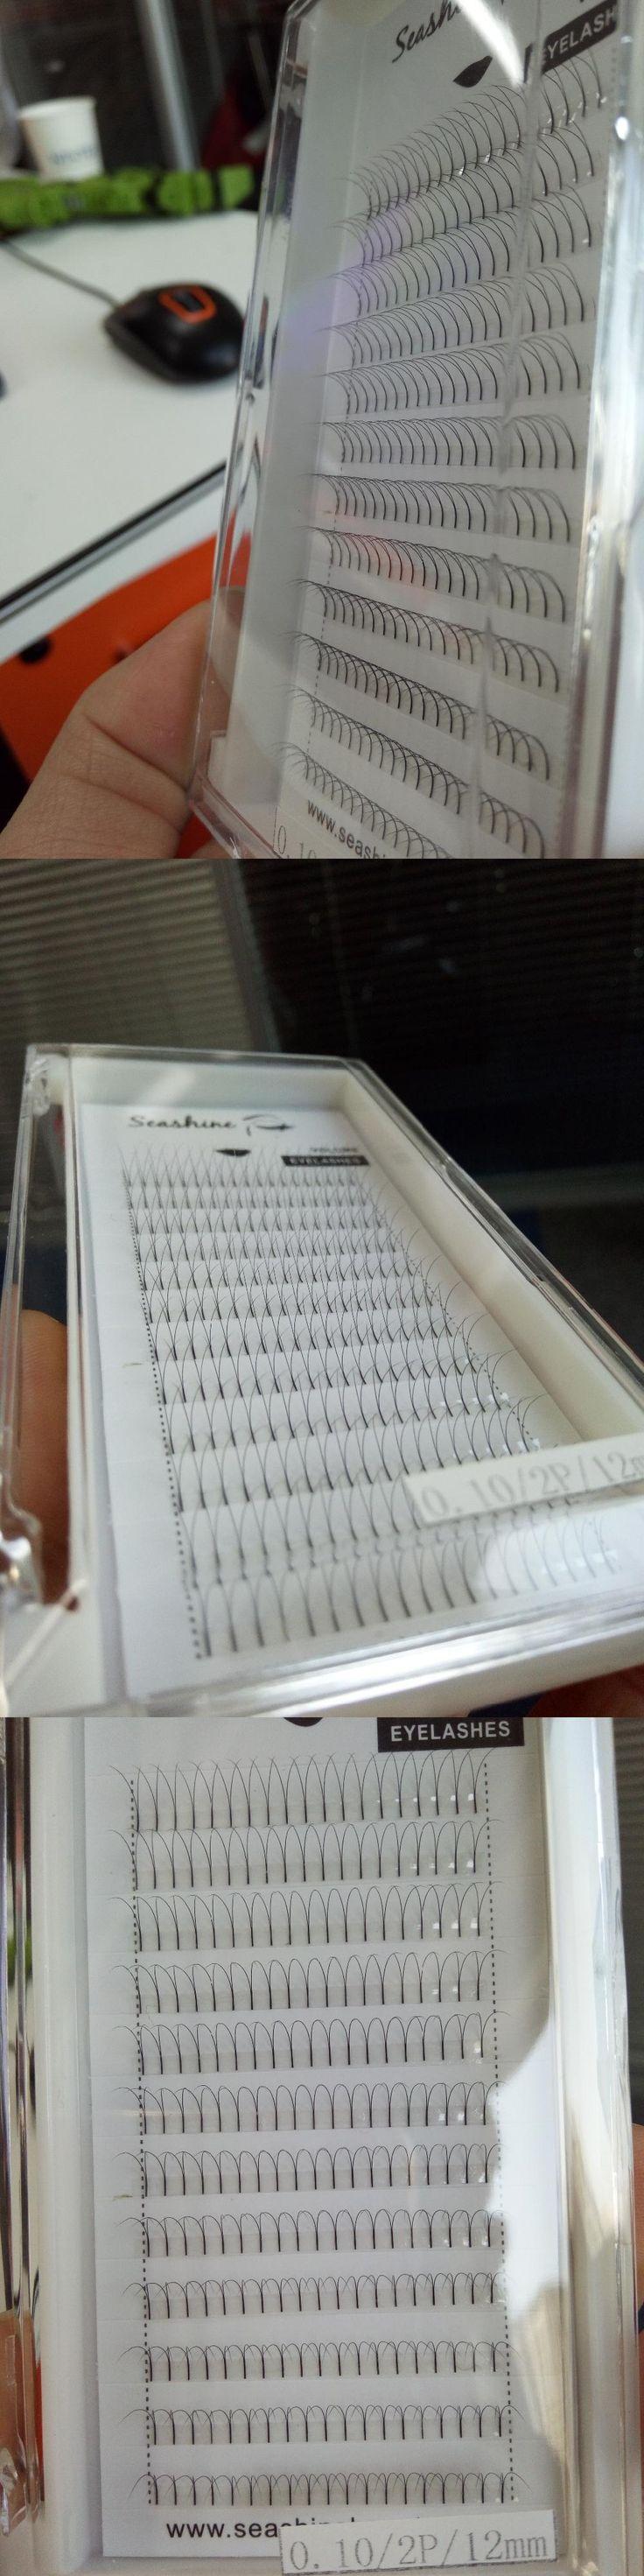 [Visit to Buy] Hot sale Premade Volume Lash 2D Volume Fans Semi Permanent Individual Eyelash Extensions free shipping #Advertisement